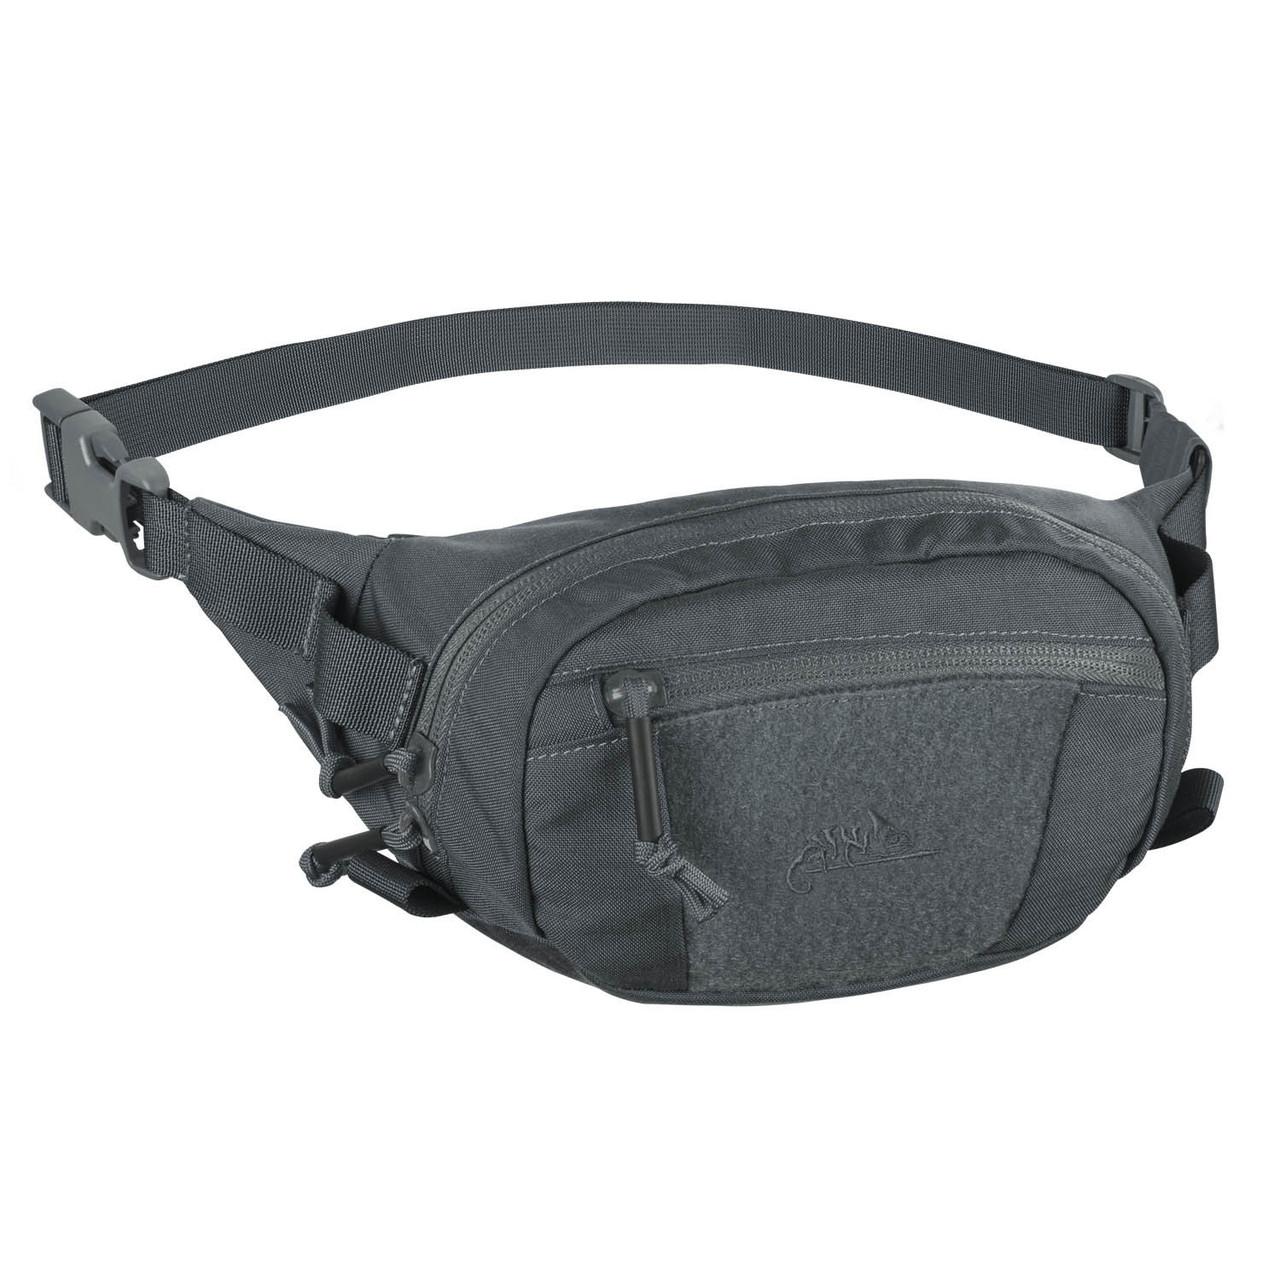 Сумка поясная Helikon-Tex® POSSUM® Waist Pack - Cordura® - Темно-серая